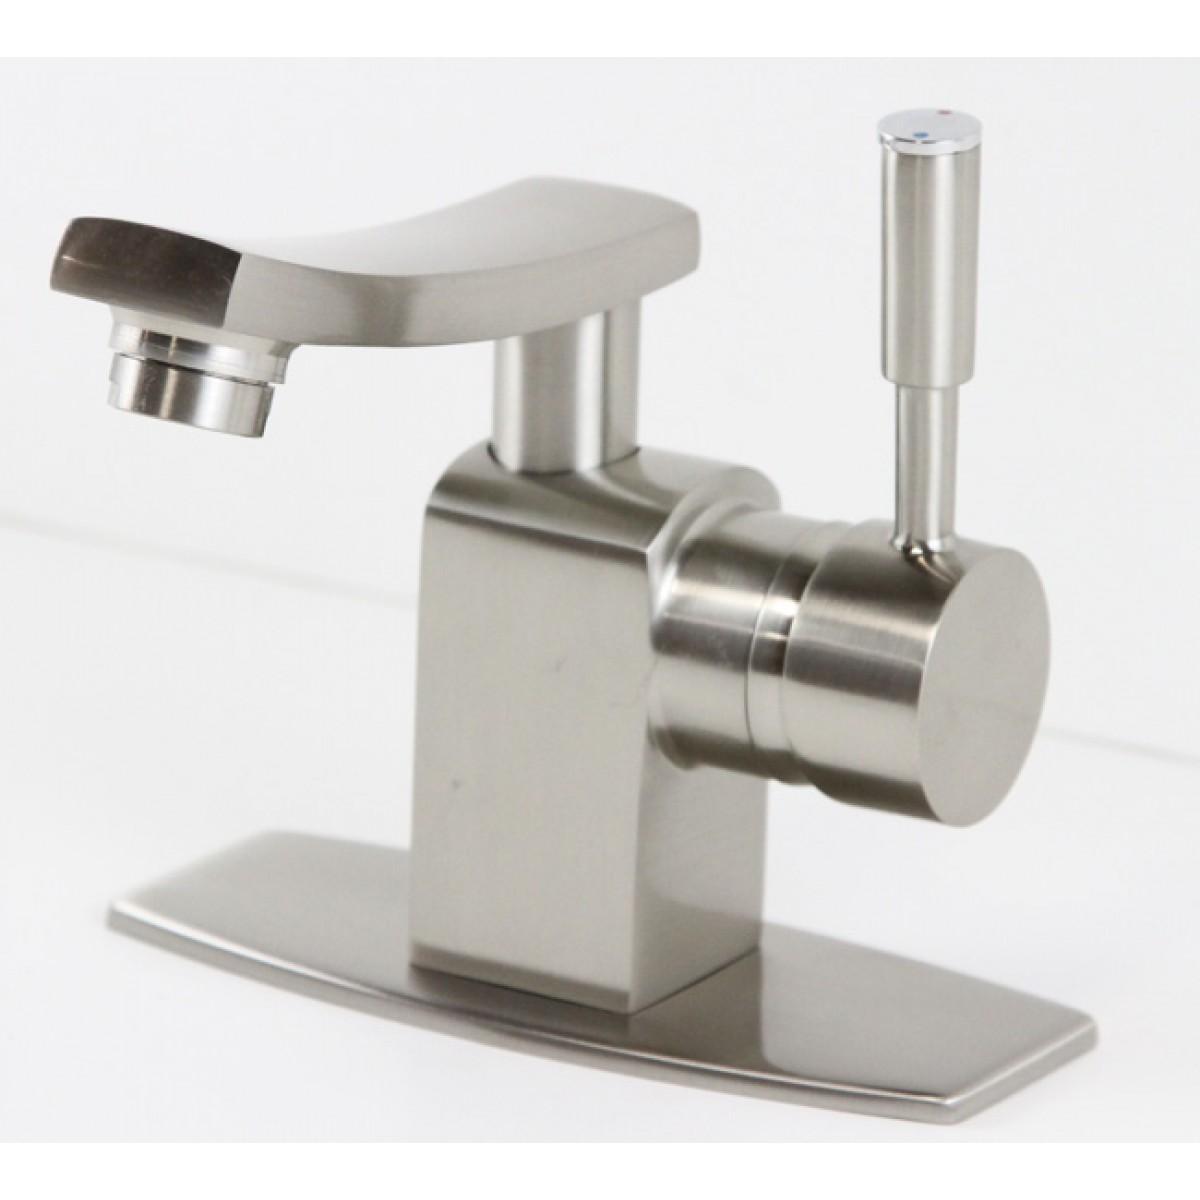 Brushed Nickle Bathroom Vessel Sink Faucet Hole Cover Deck